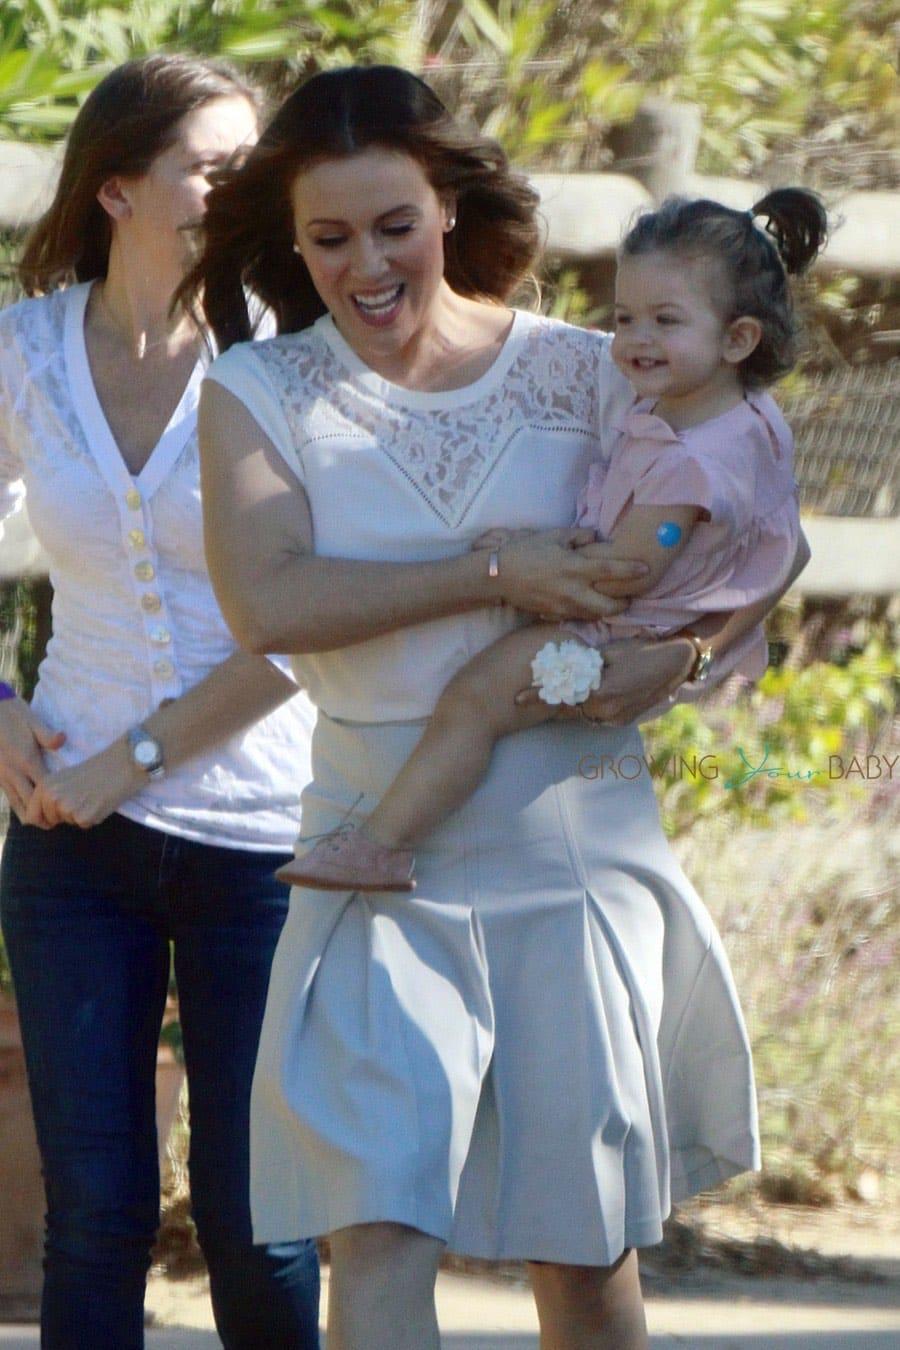 Alyssa Milano On Set With Her Daughter Elizabella Growing